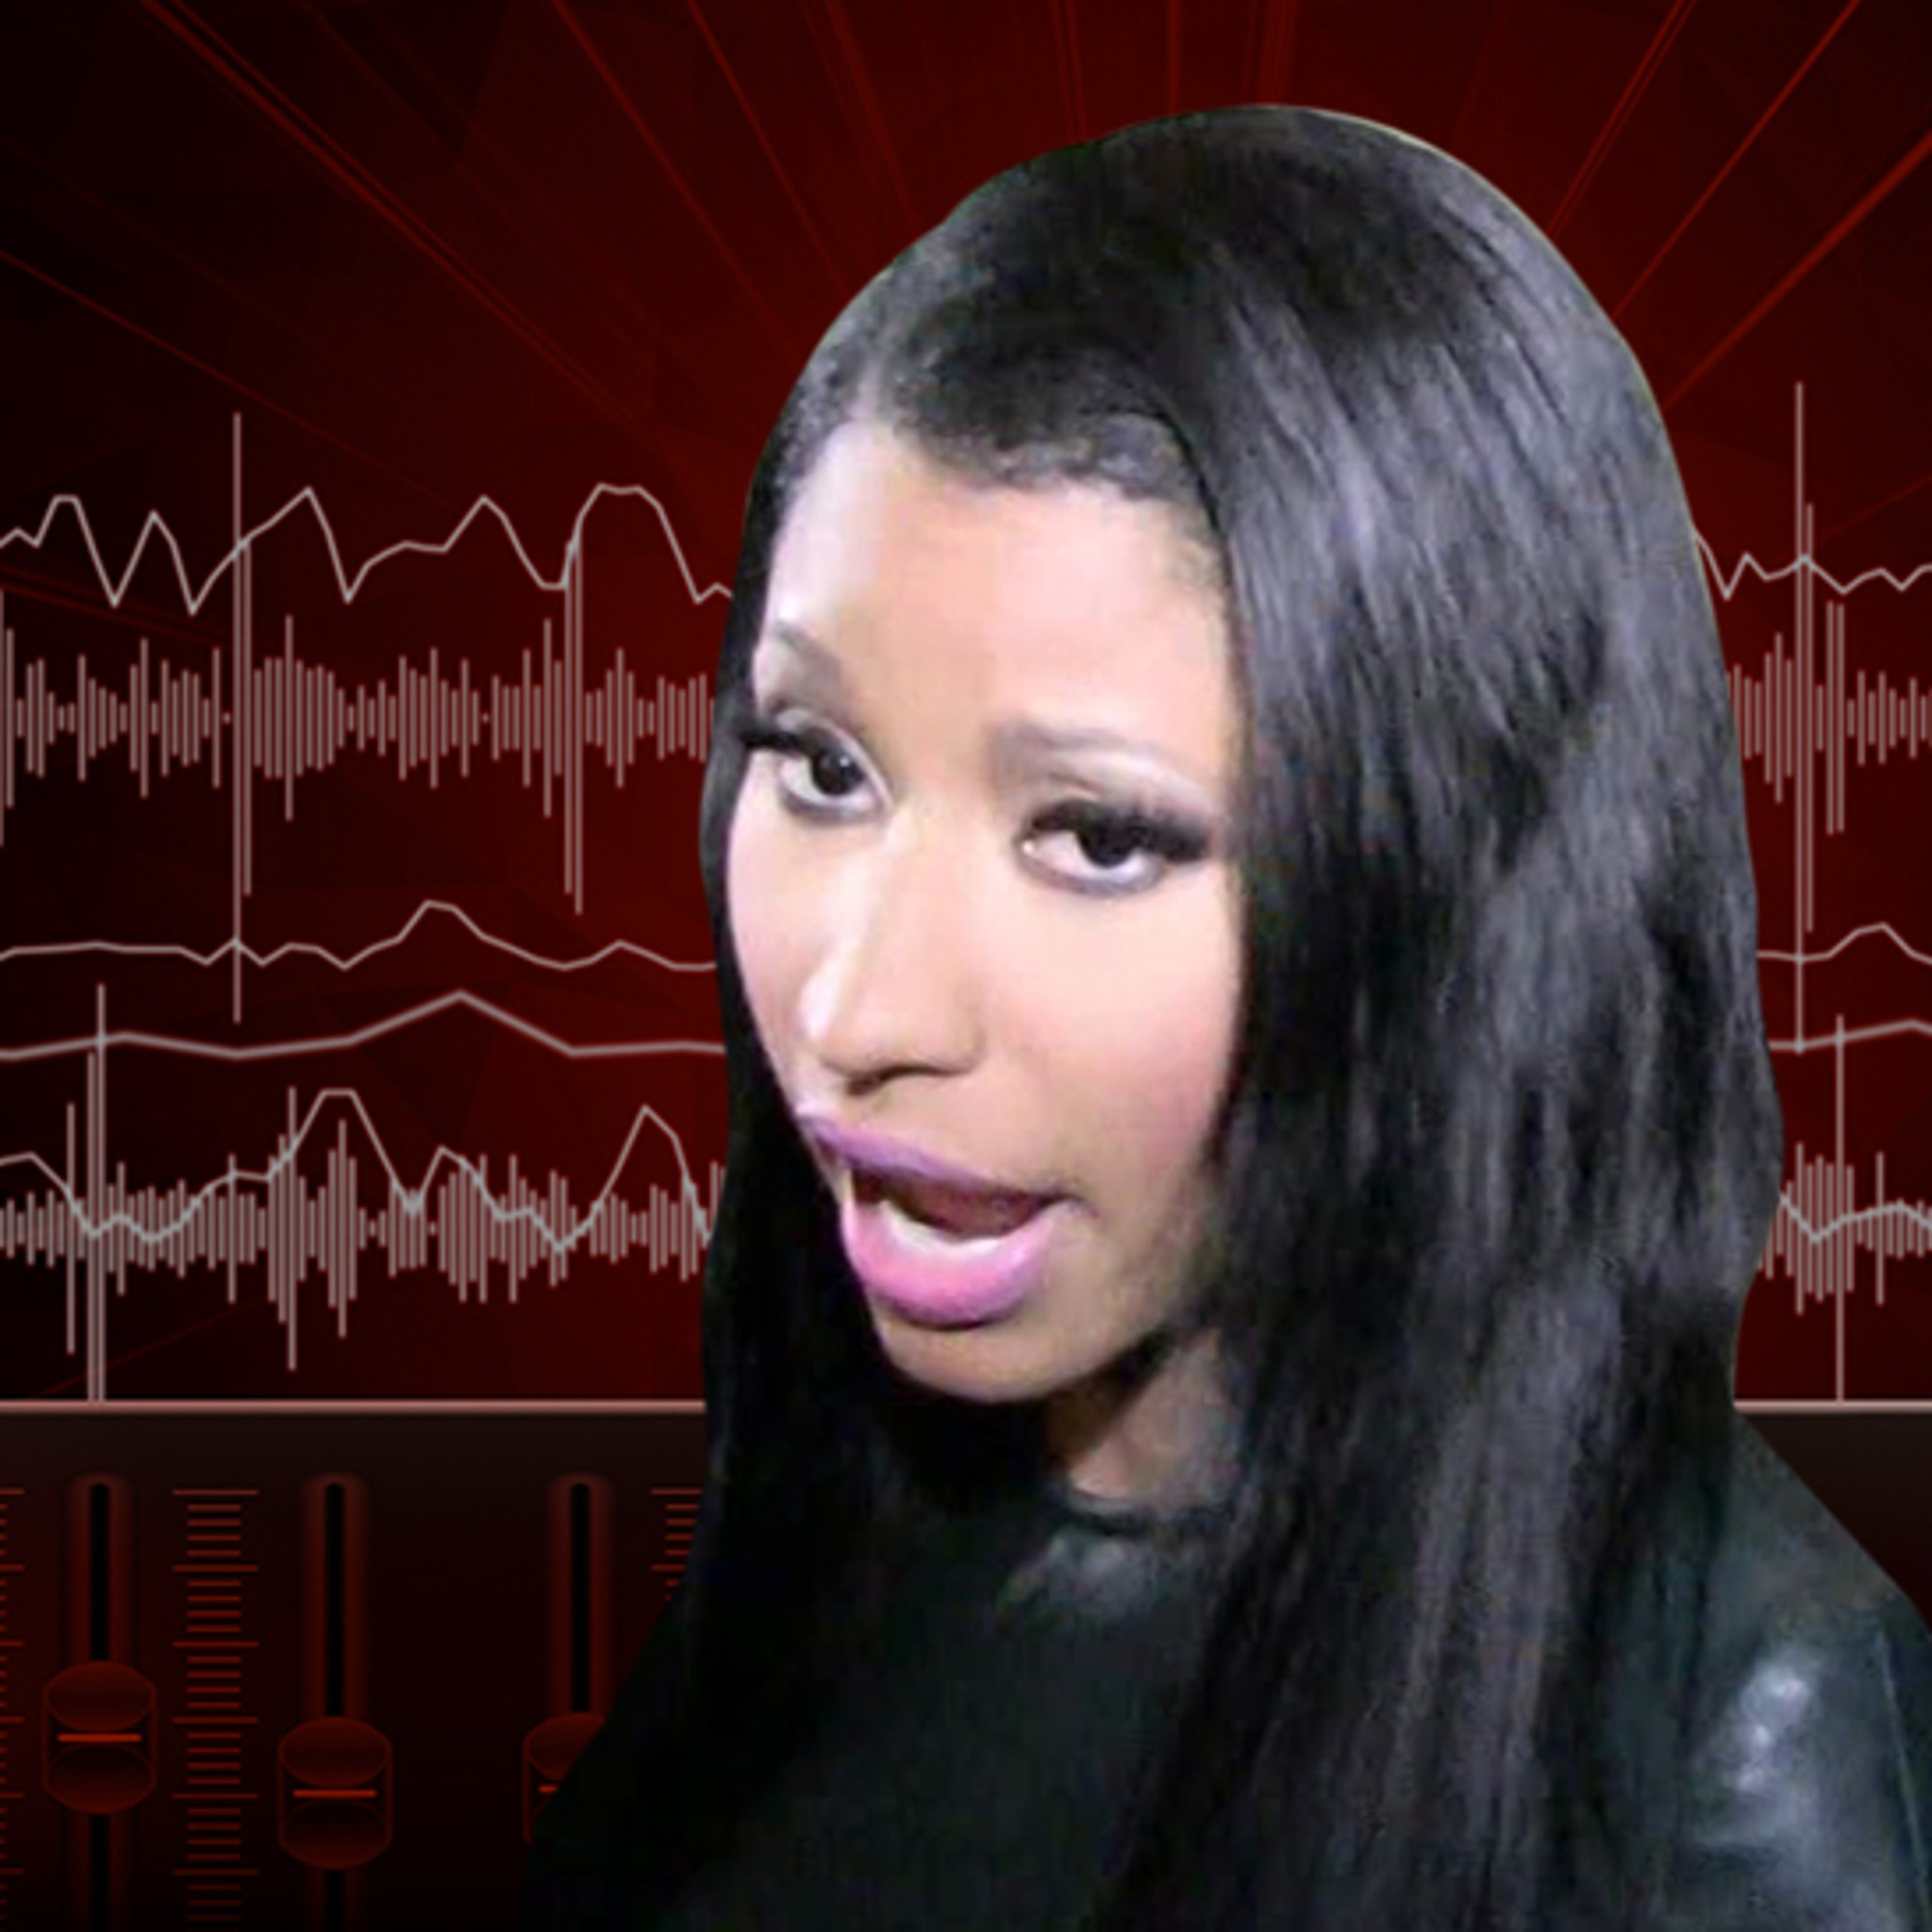 e70f4de21858 Nicki Minaj Says She Loves Kylie Jenner Amid Travis Scott Beef